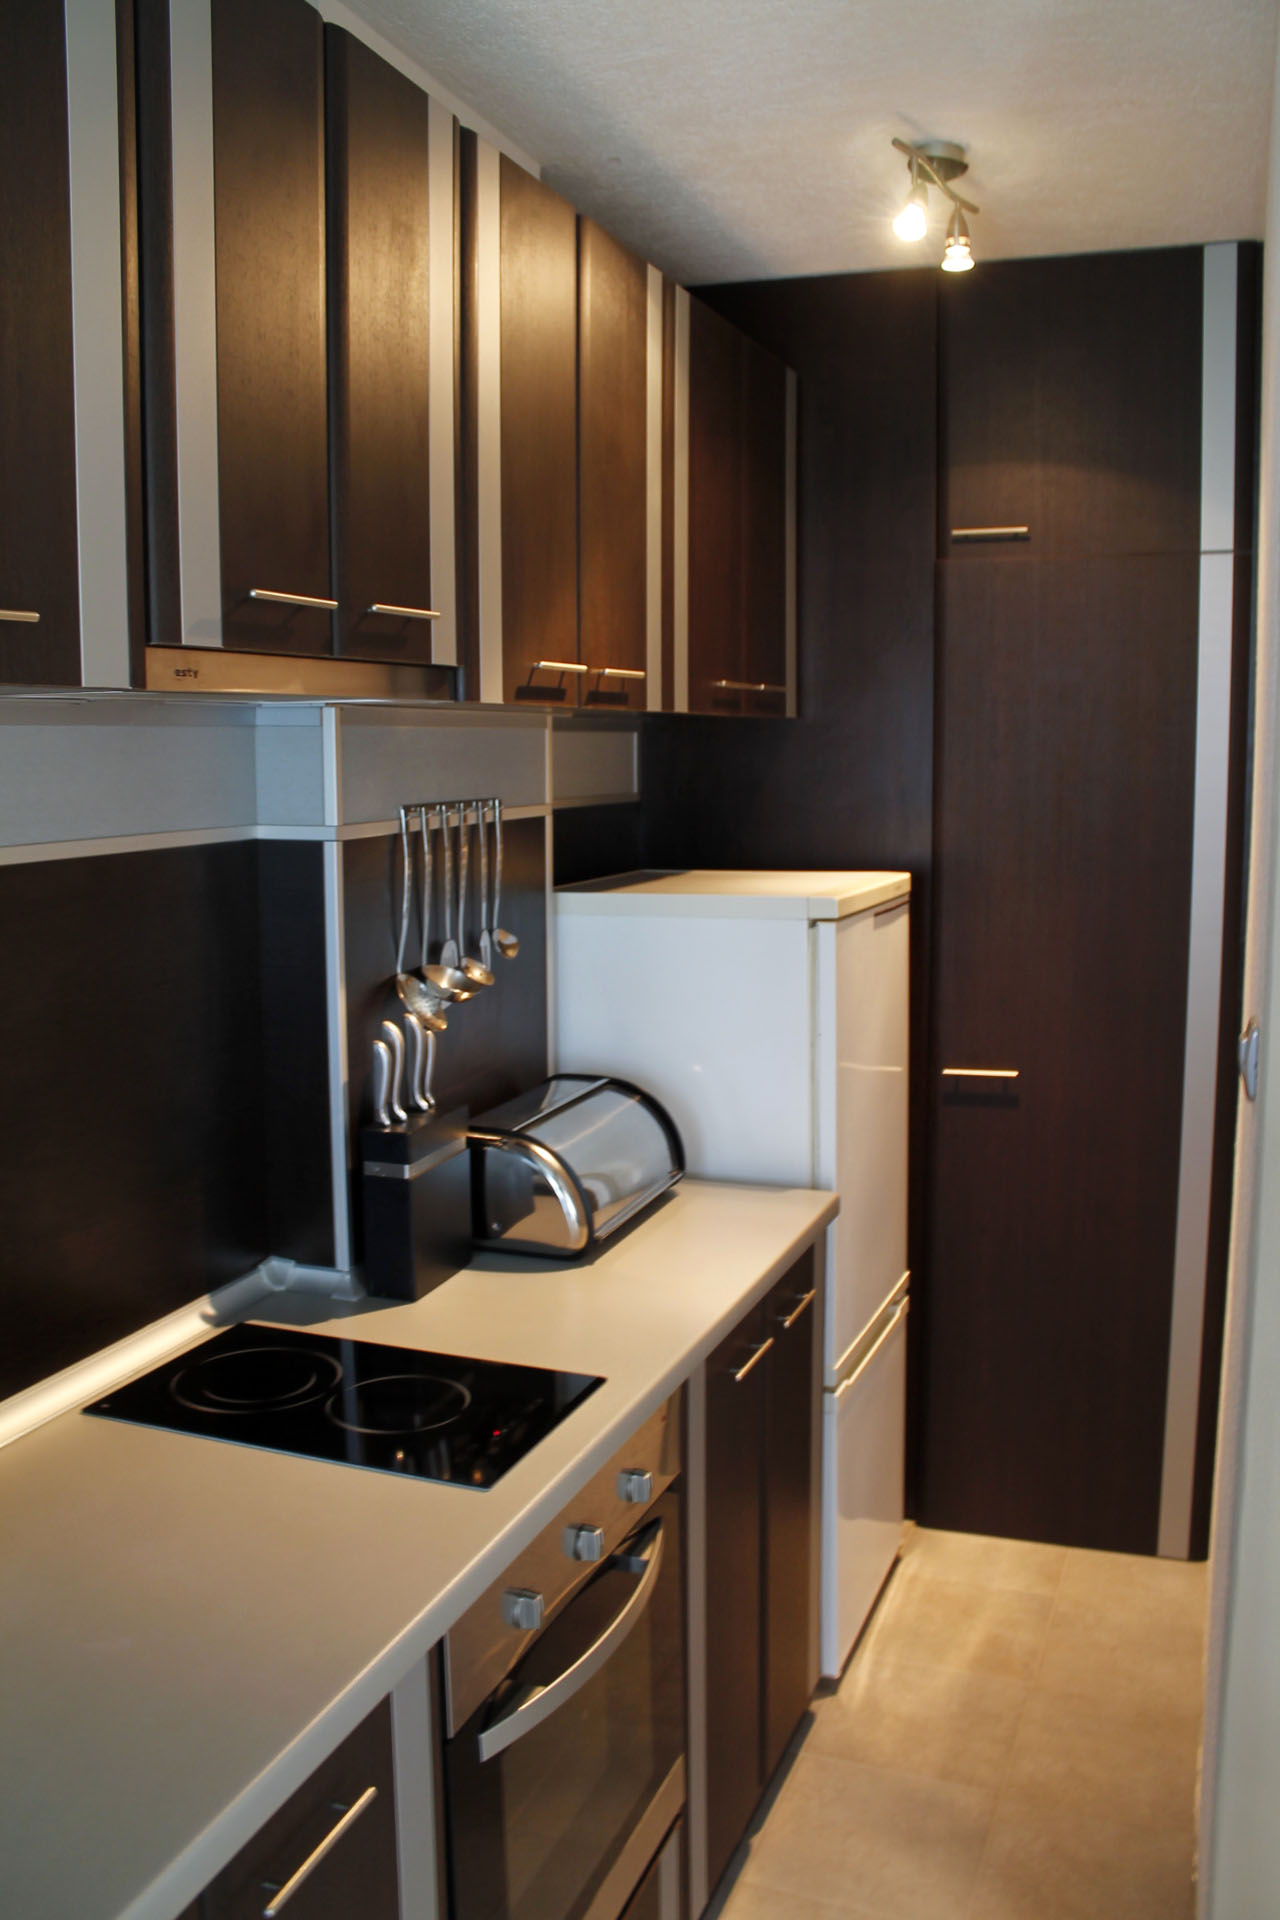 Къща за гости Златоград кухня 6.1